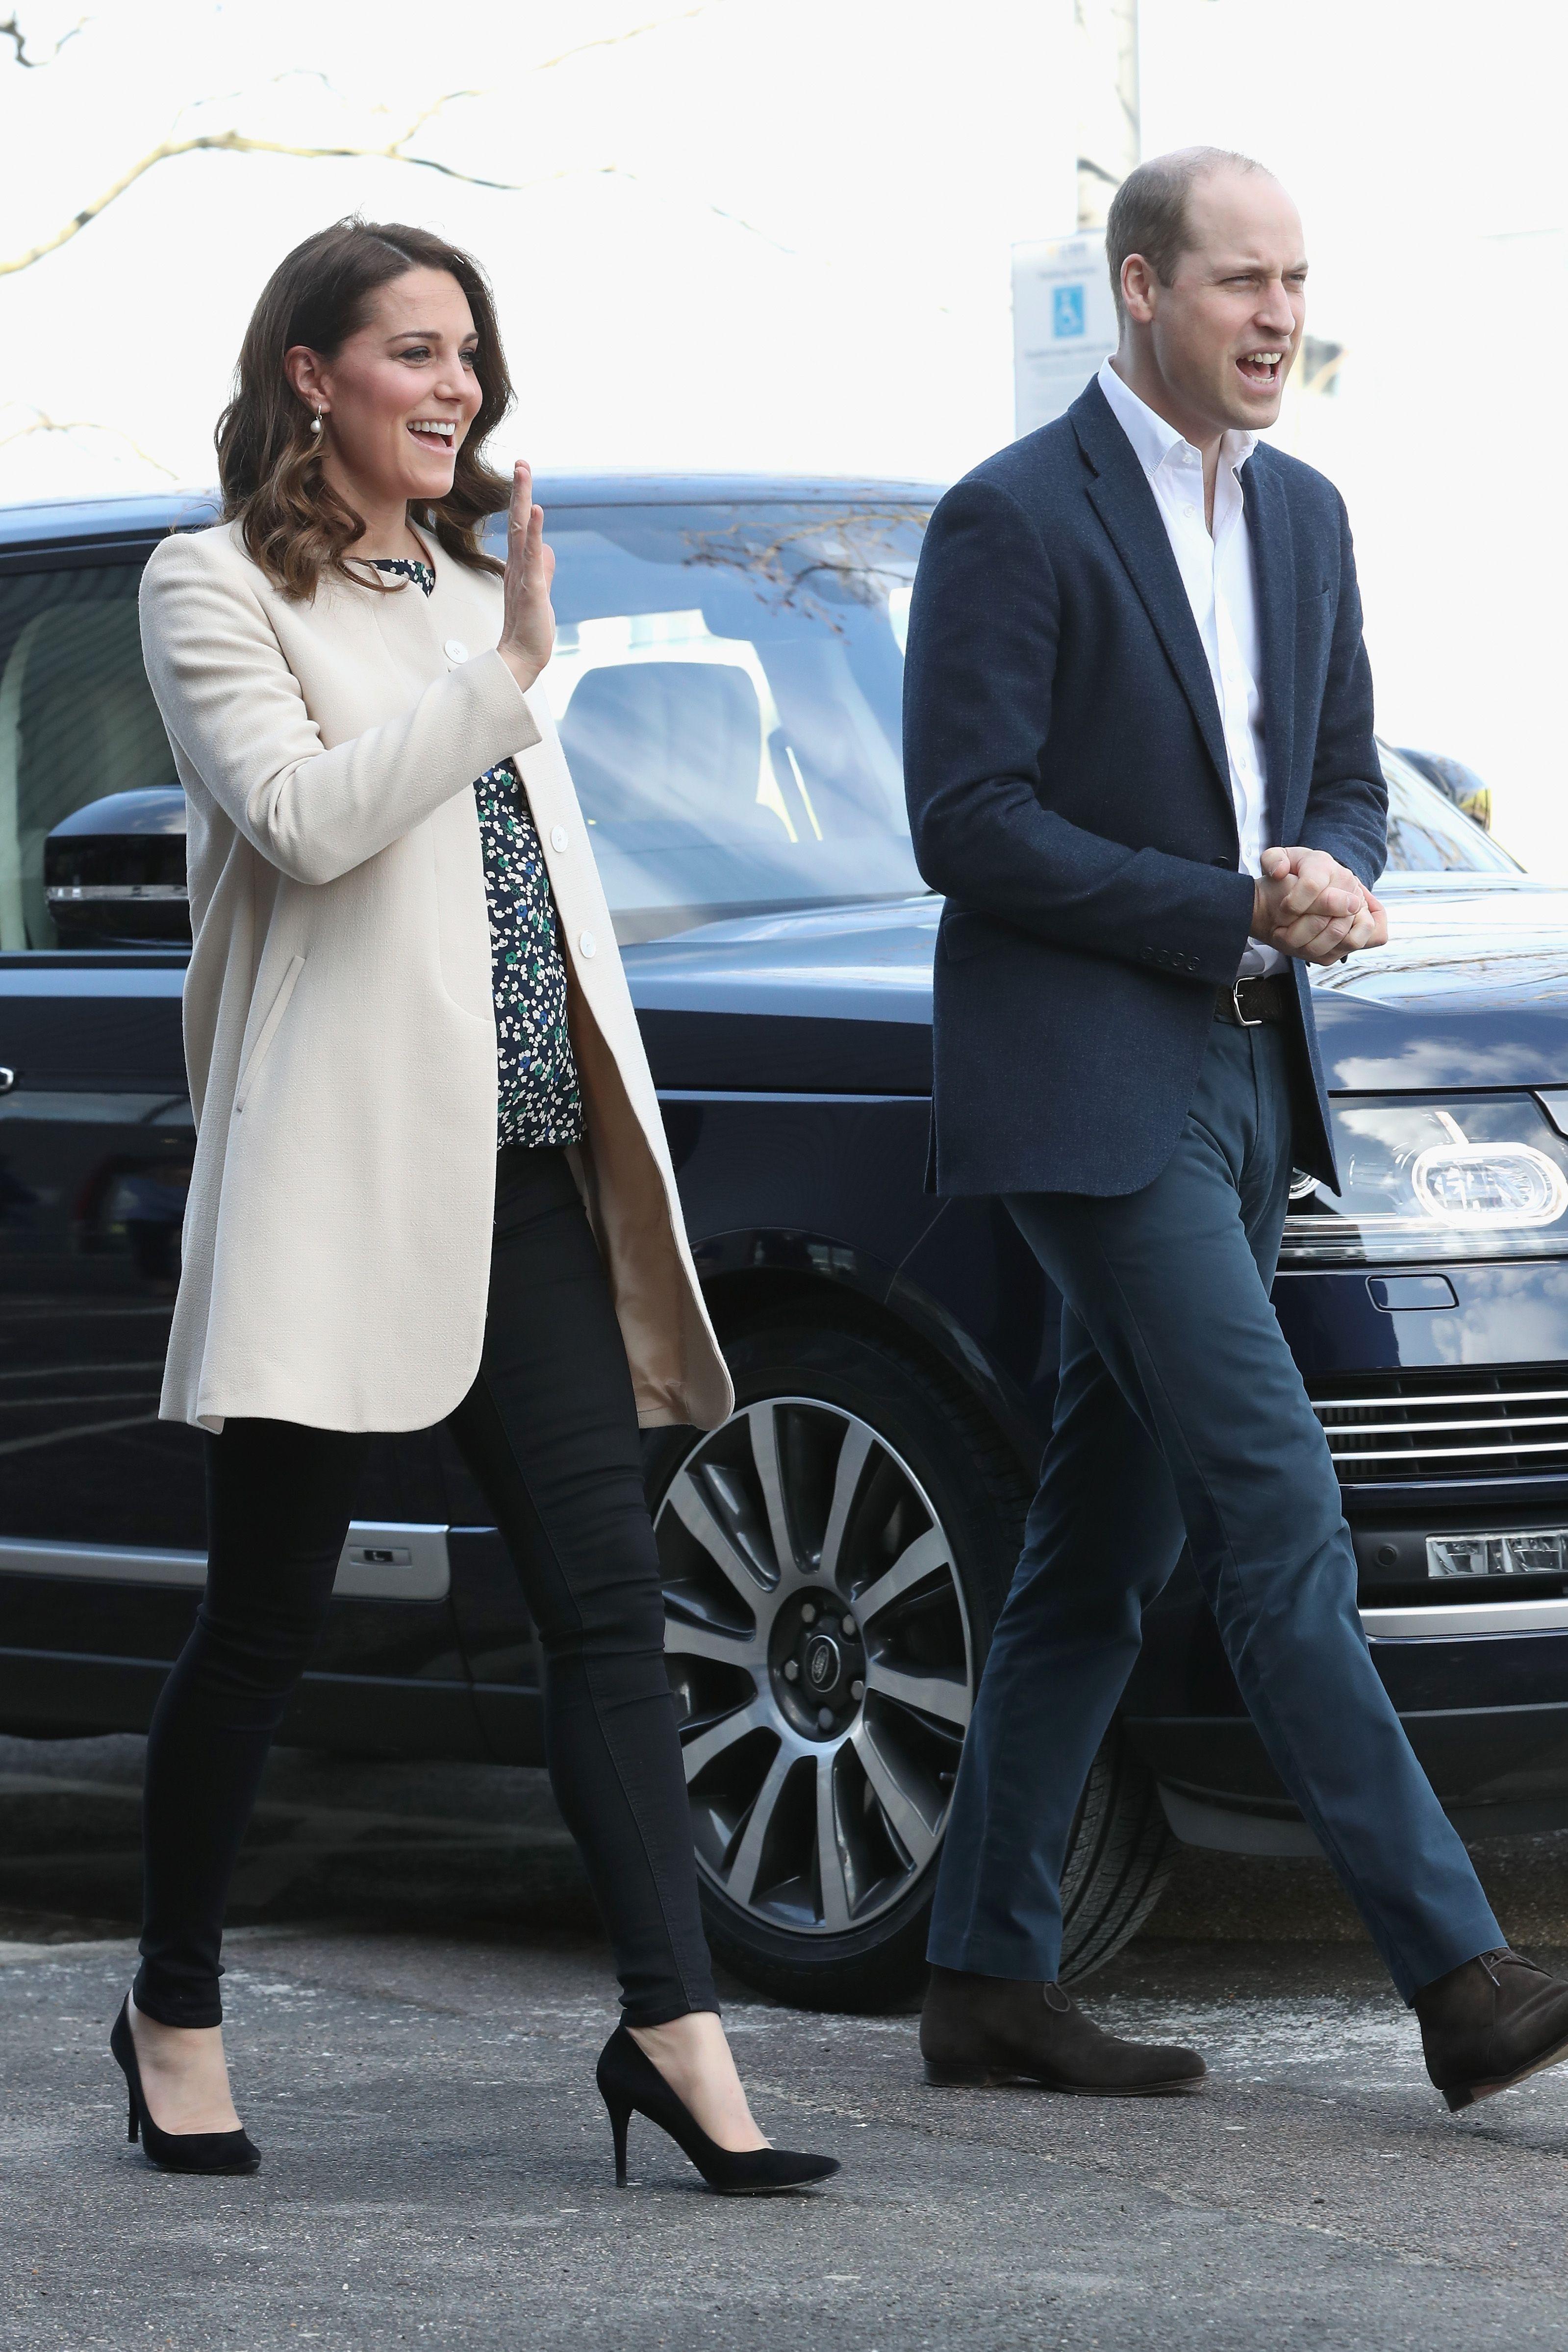 kate middleton wearing skinny jeans